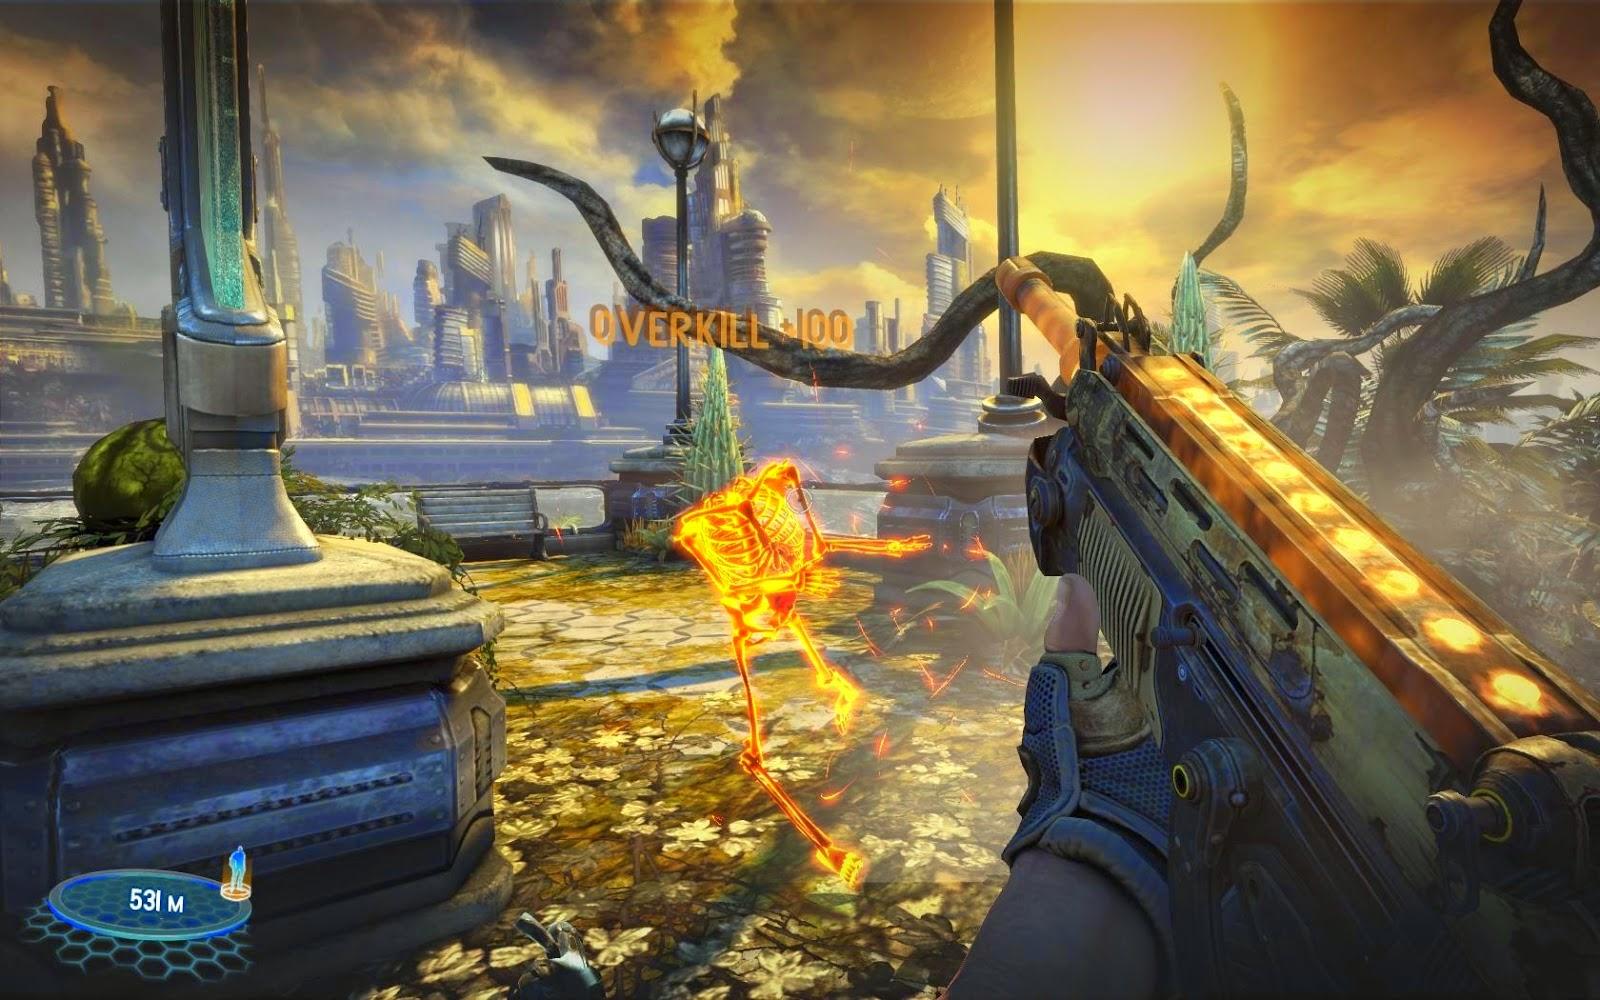 Bulletstorm Free Download Full Version